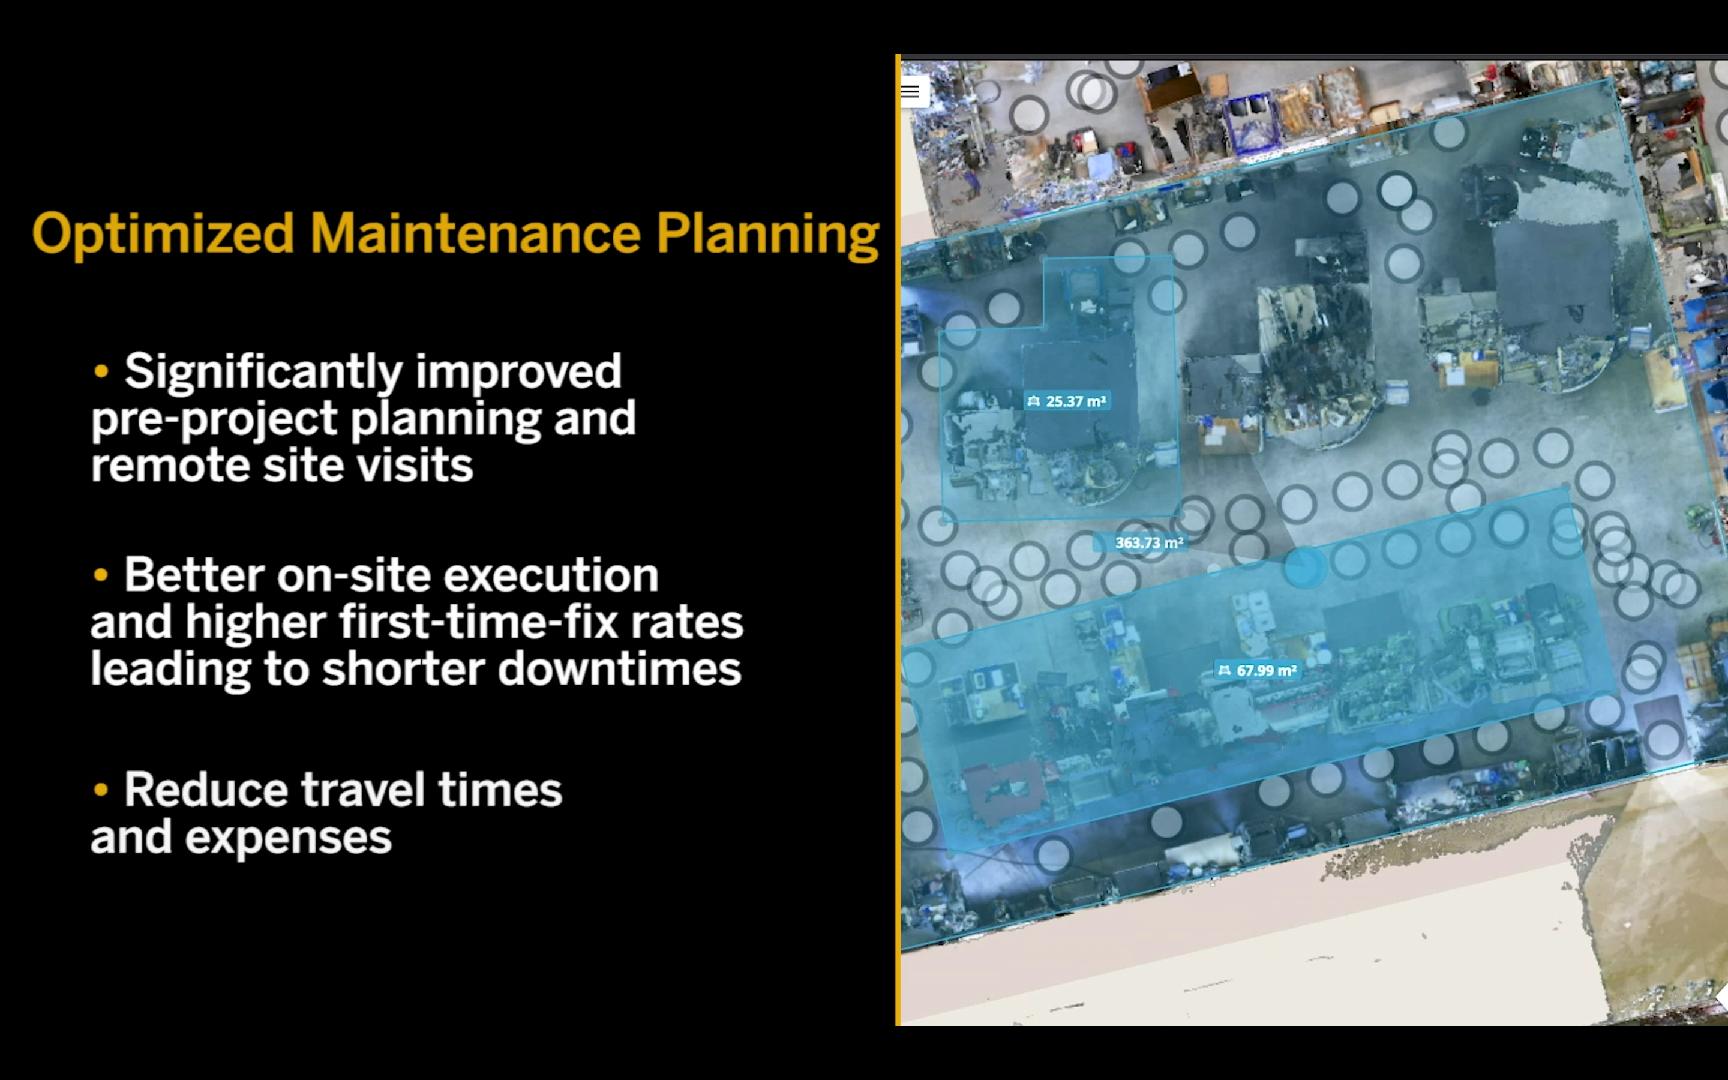 Optimized maintenance planning